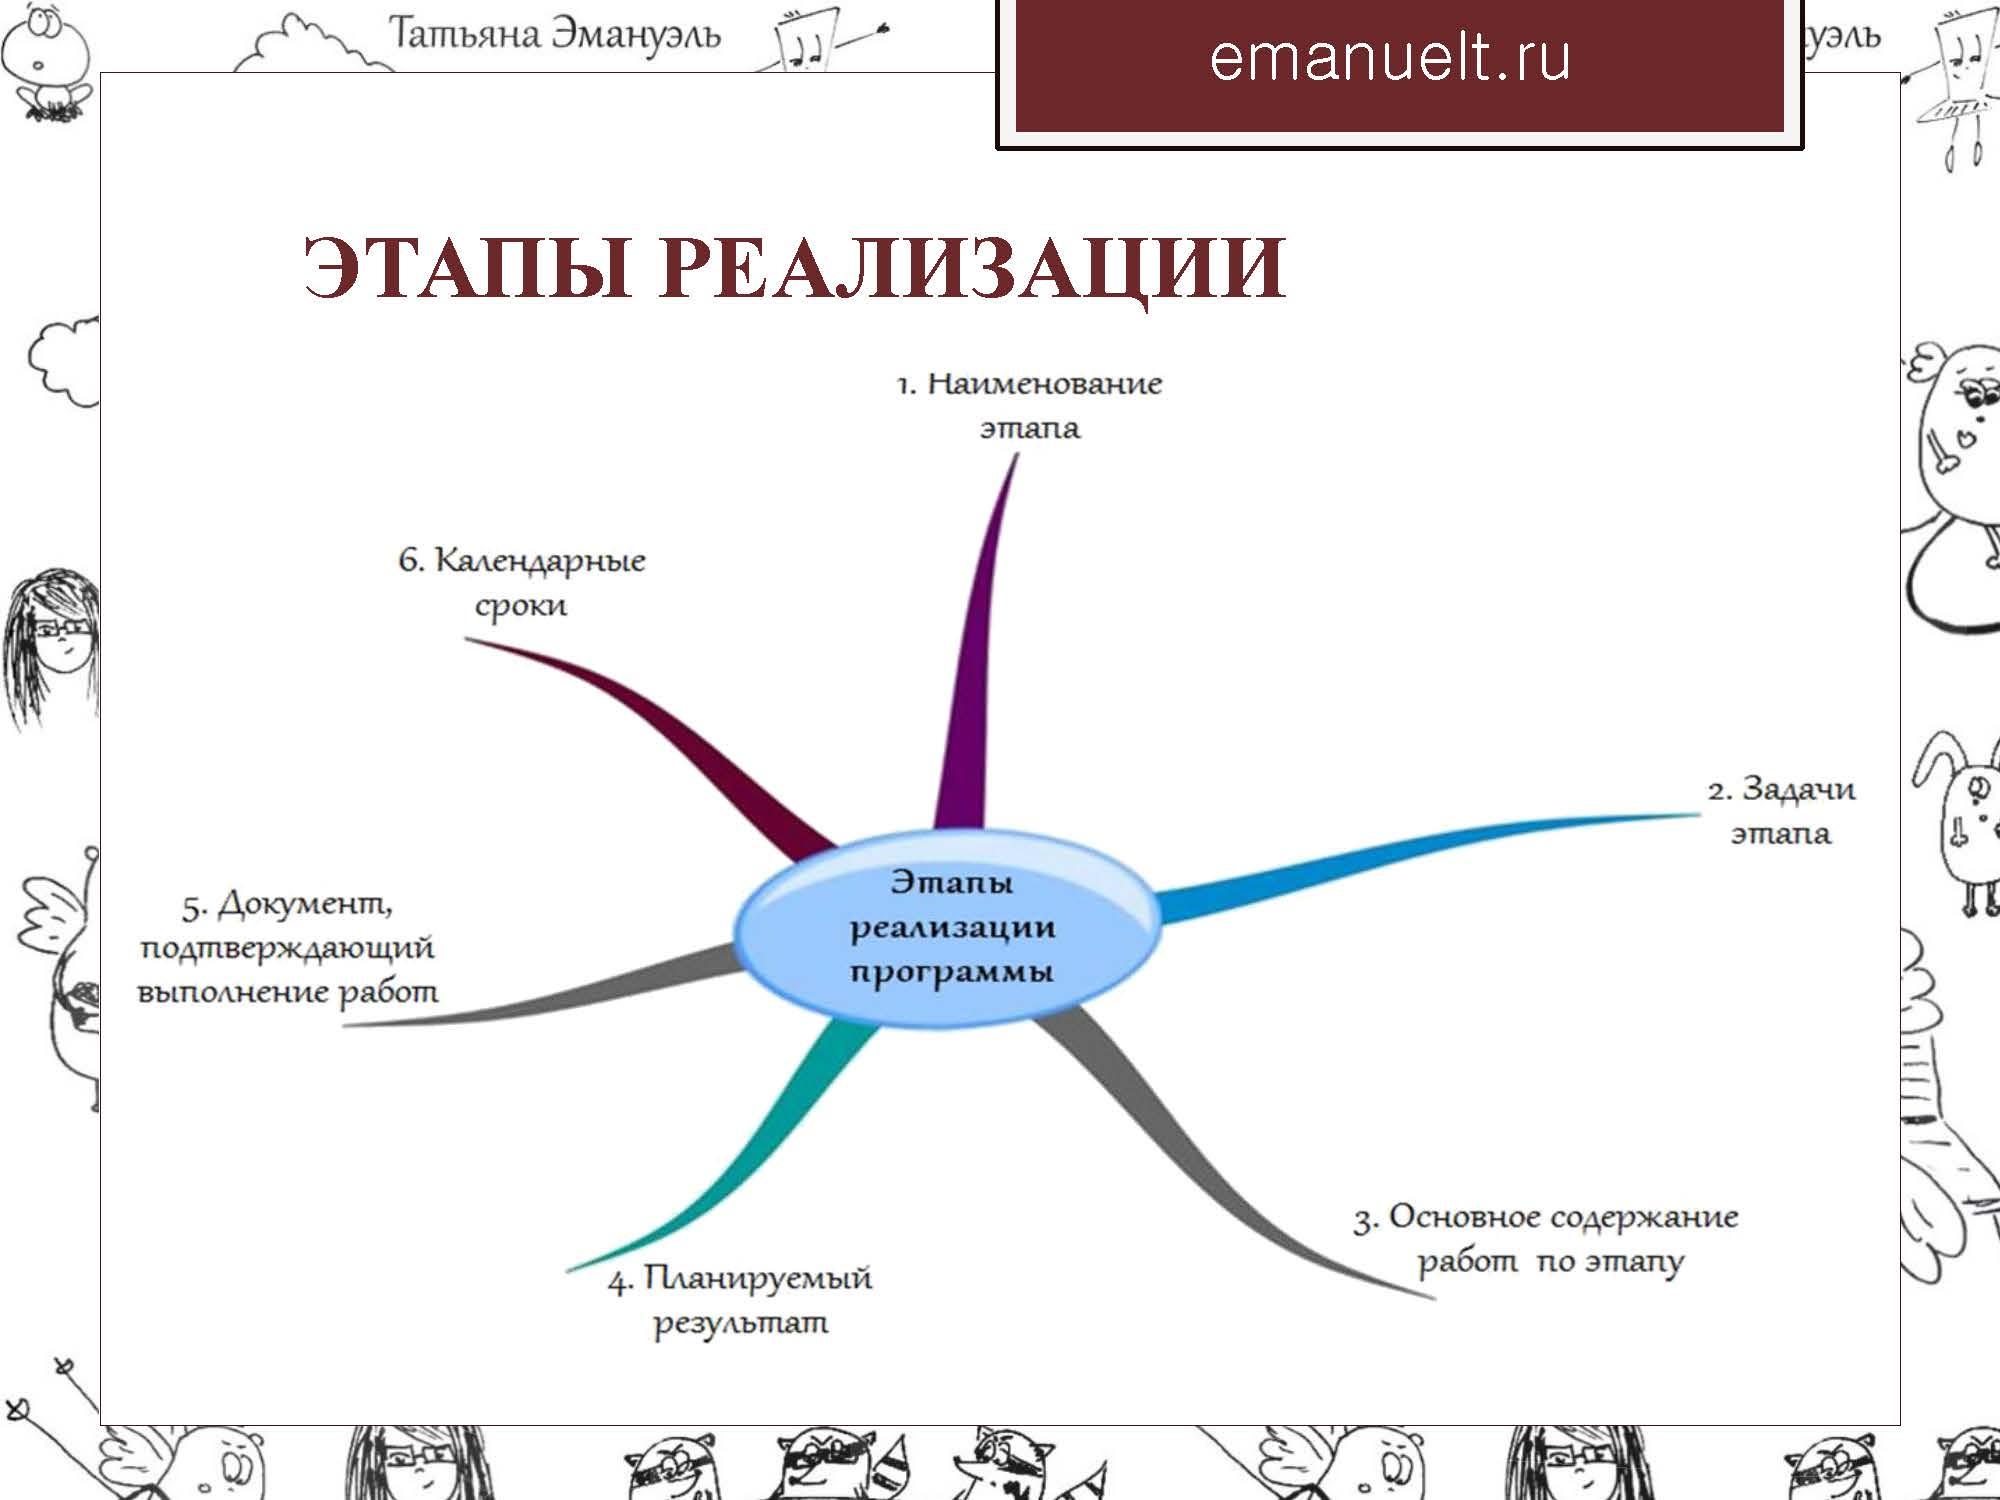 06 февраля эмануэль_Страница_045